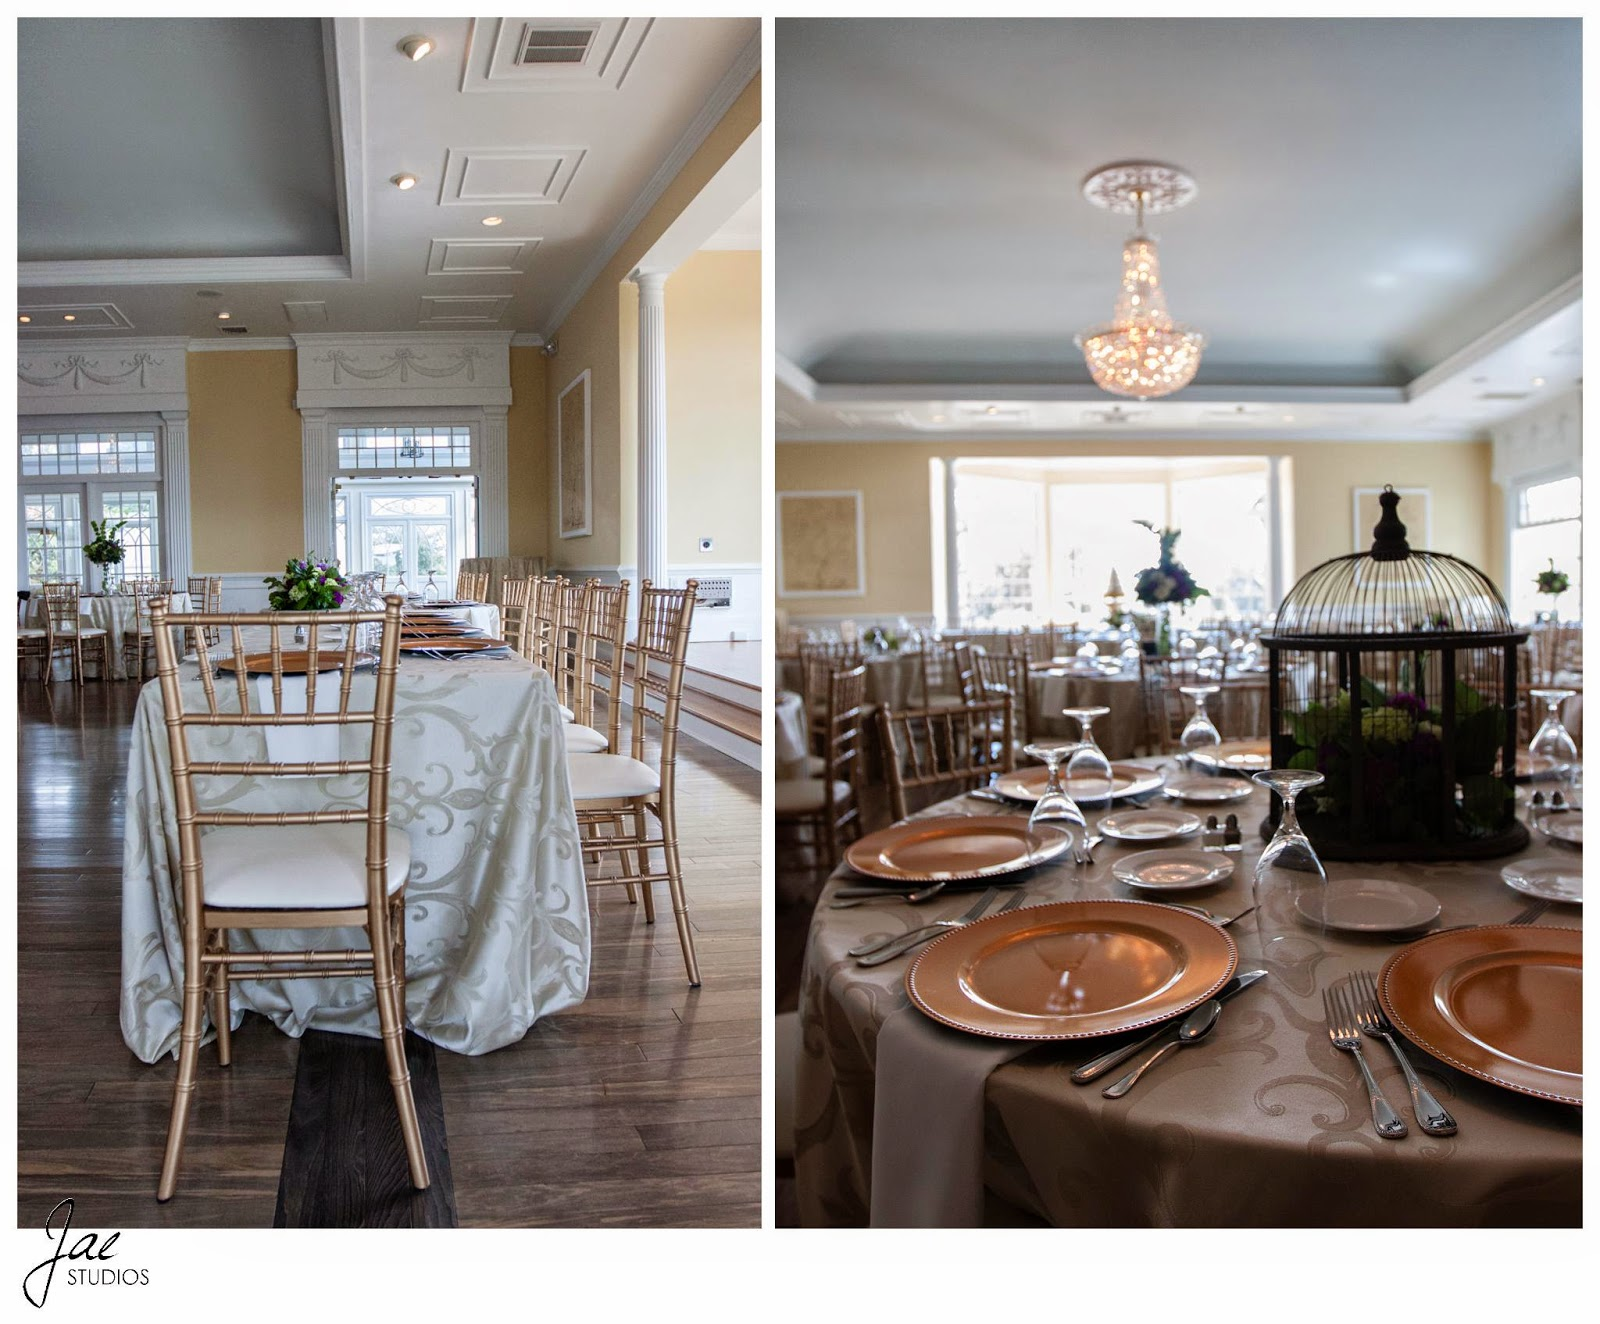 Jonathan and Julie, Bird cage, West Manor Estate, Wedding, Lynchburg, Virginia, Jae Studios, table, bird cage, reception, chandelier, windows, brown, gold, white